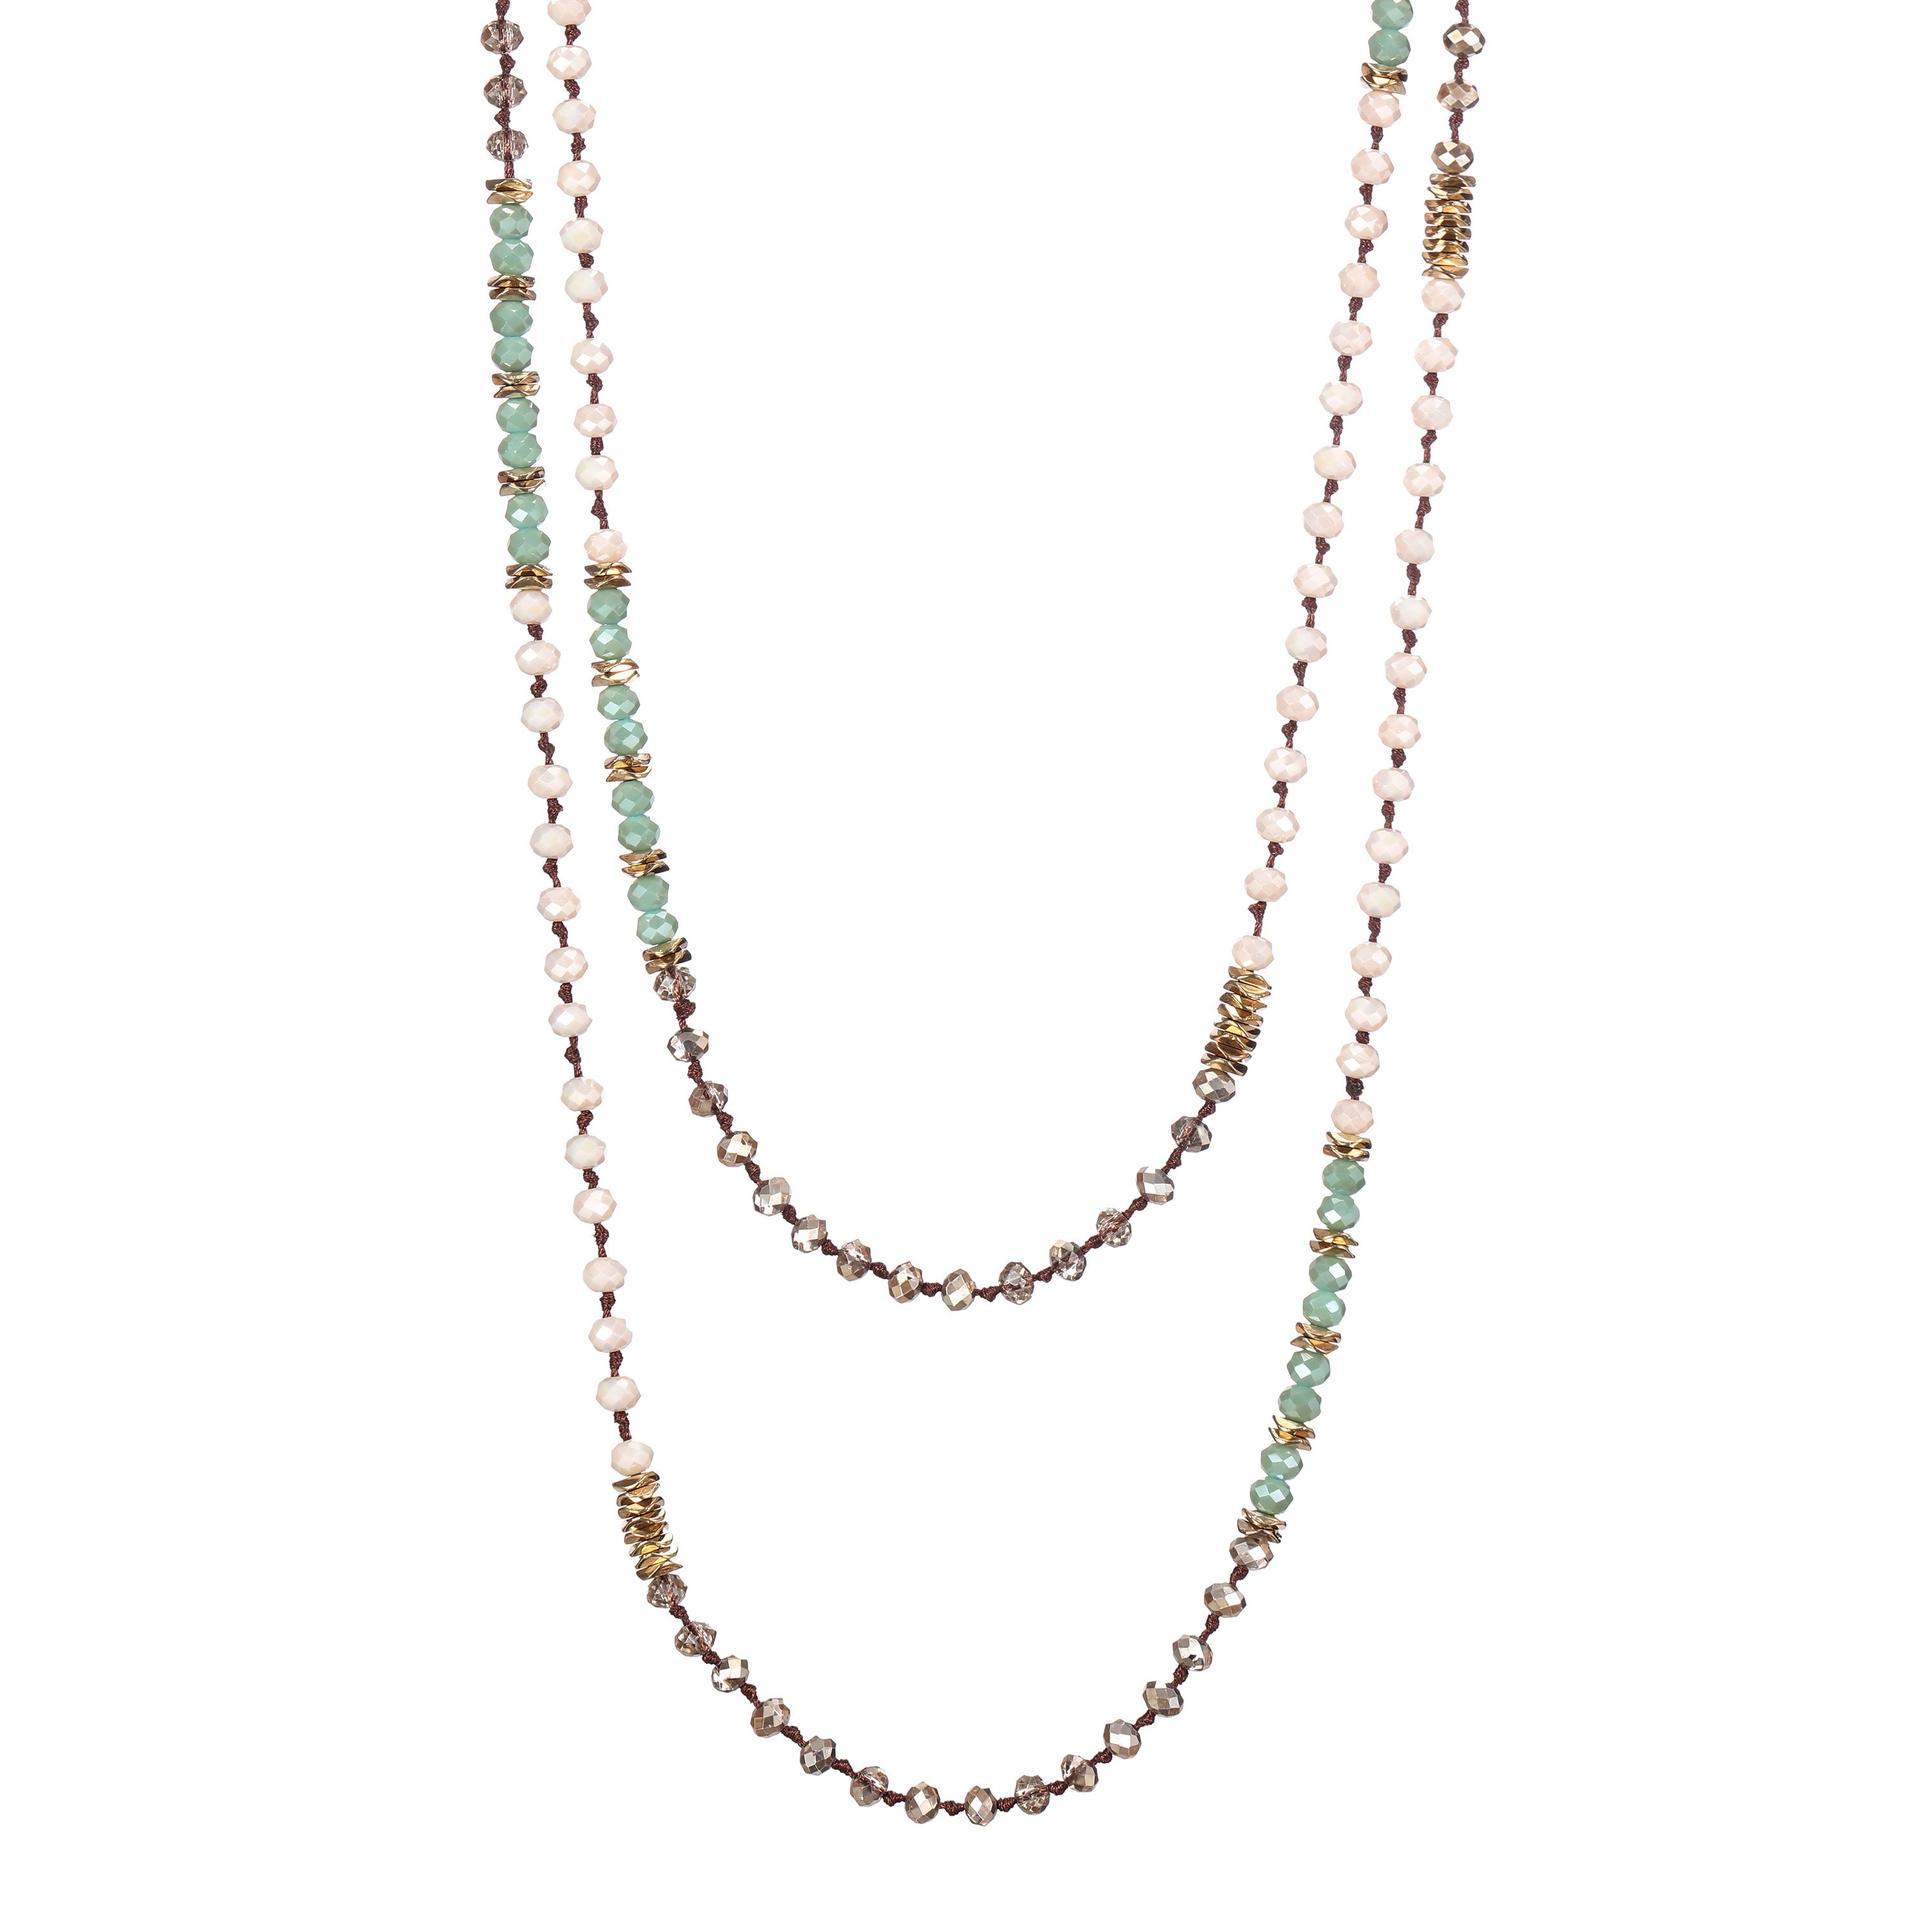 Statement Boho Multi-Layer Handmade Necklace